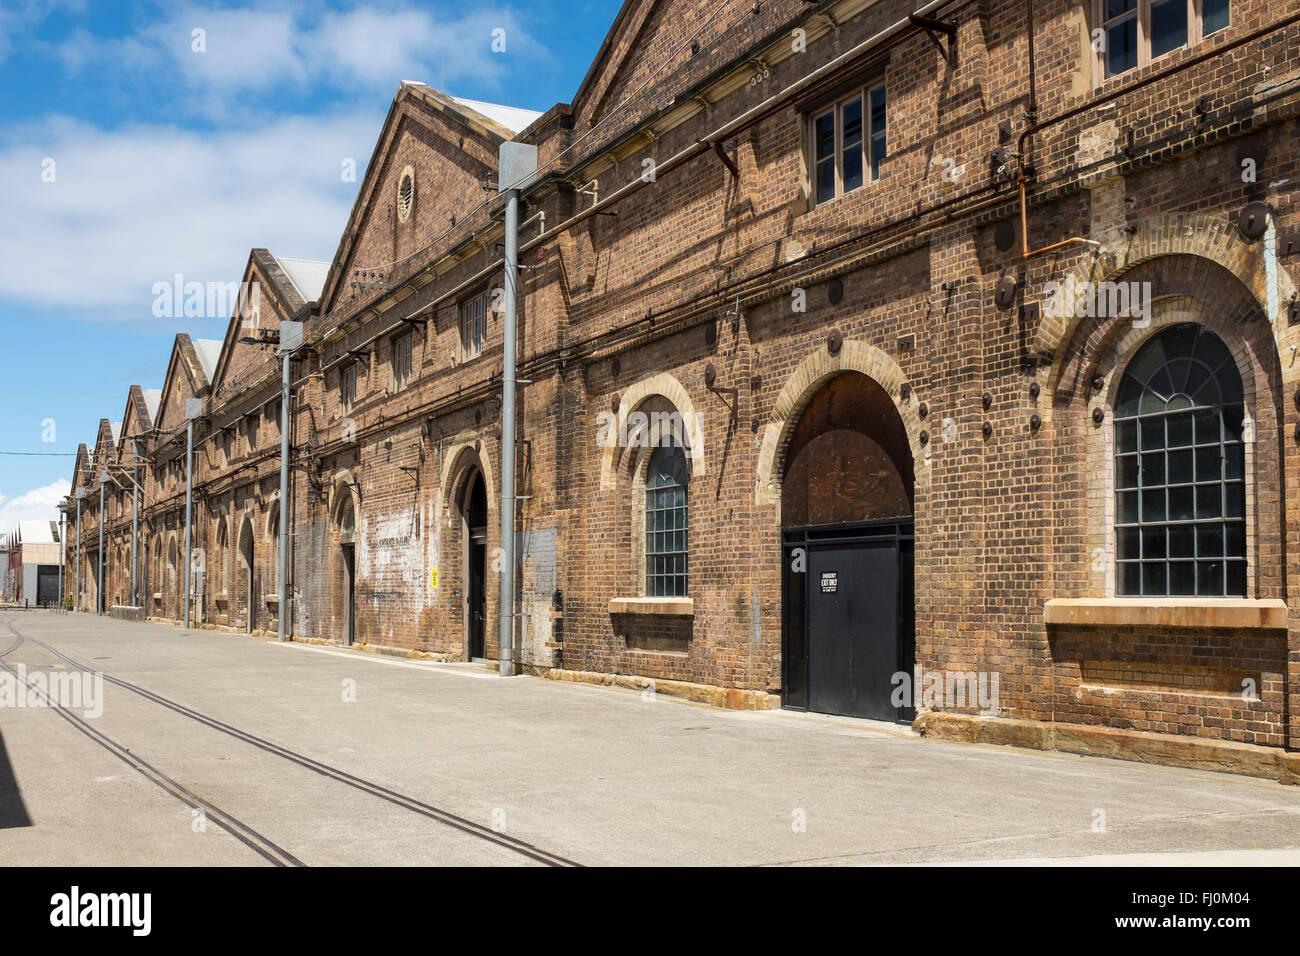 Eveleigh Carriageworks Contemporary Arts Centre, Redfern Sydney NSW Australia Stock Photo